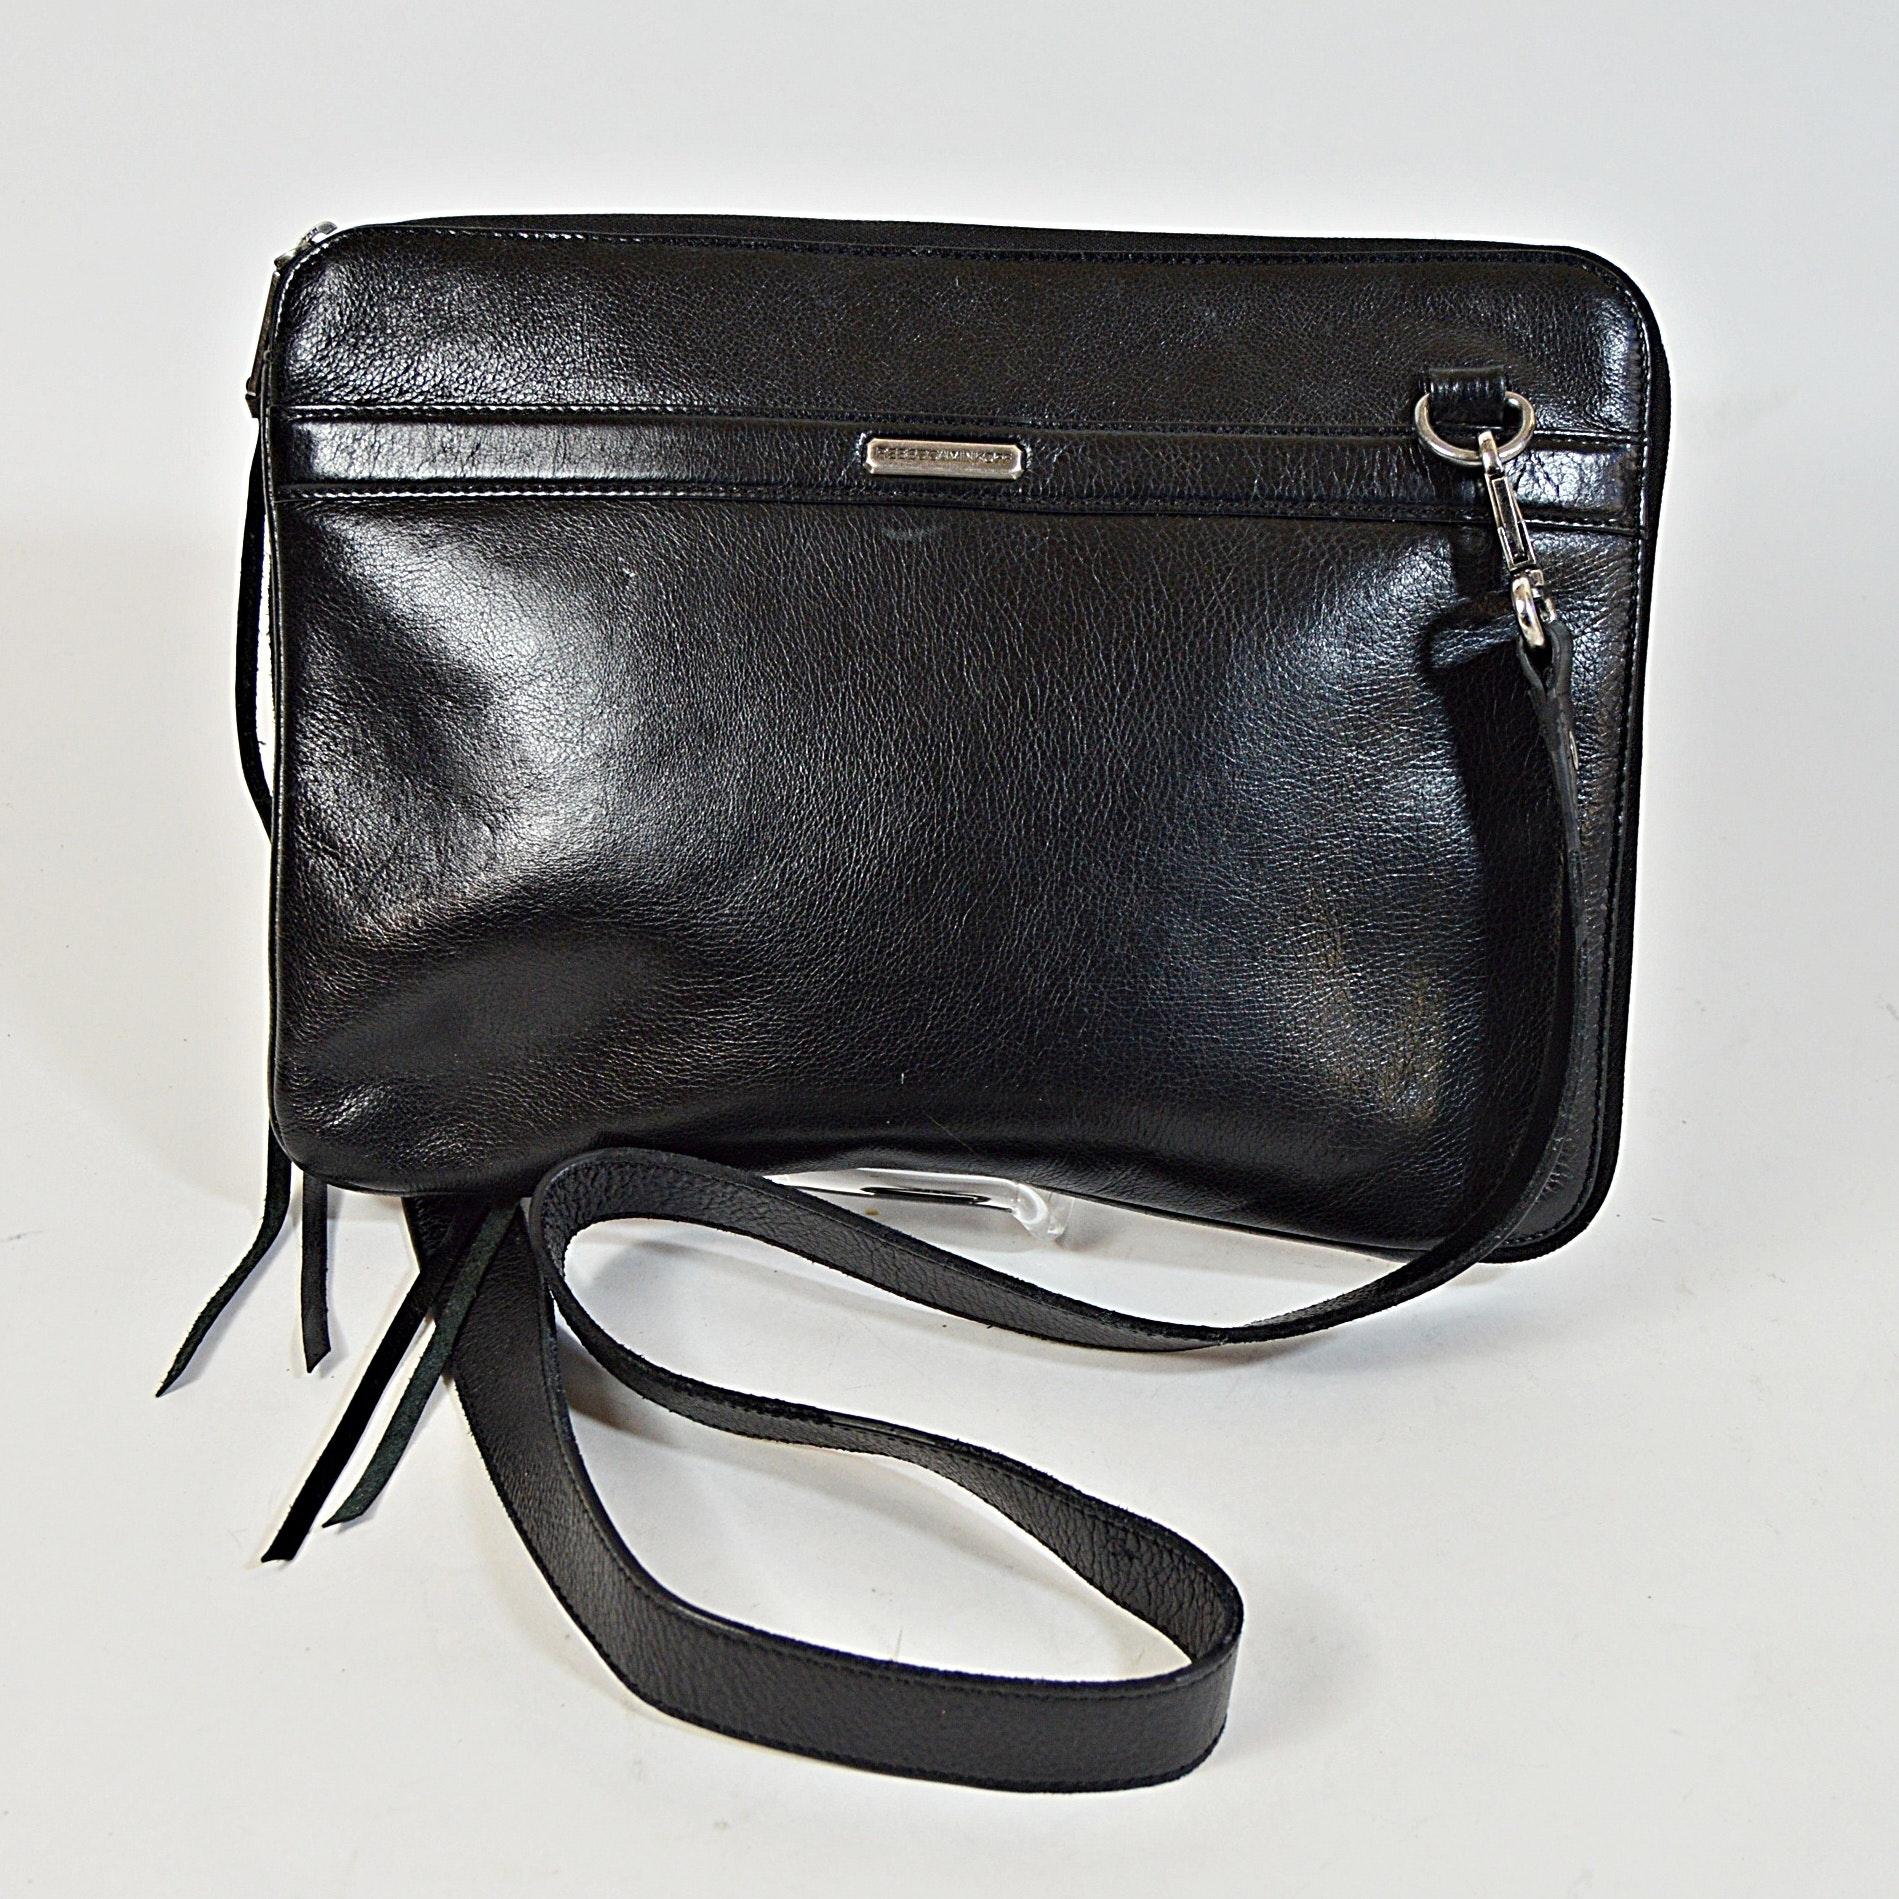 Rebecca Minkoff Black Leather Handbag